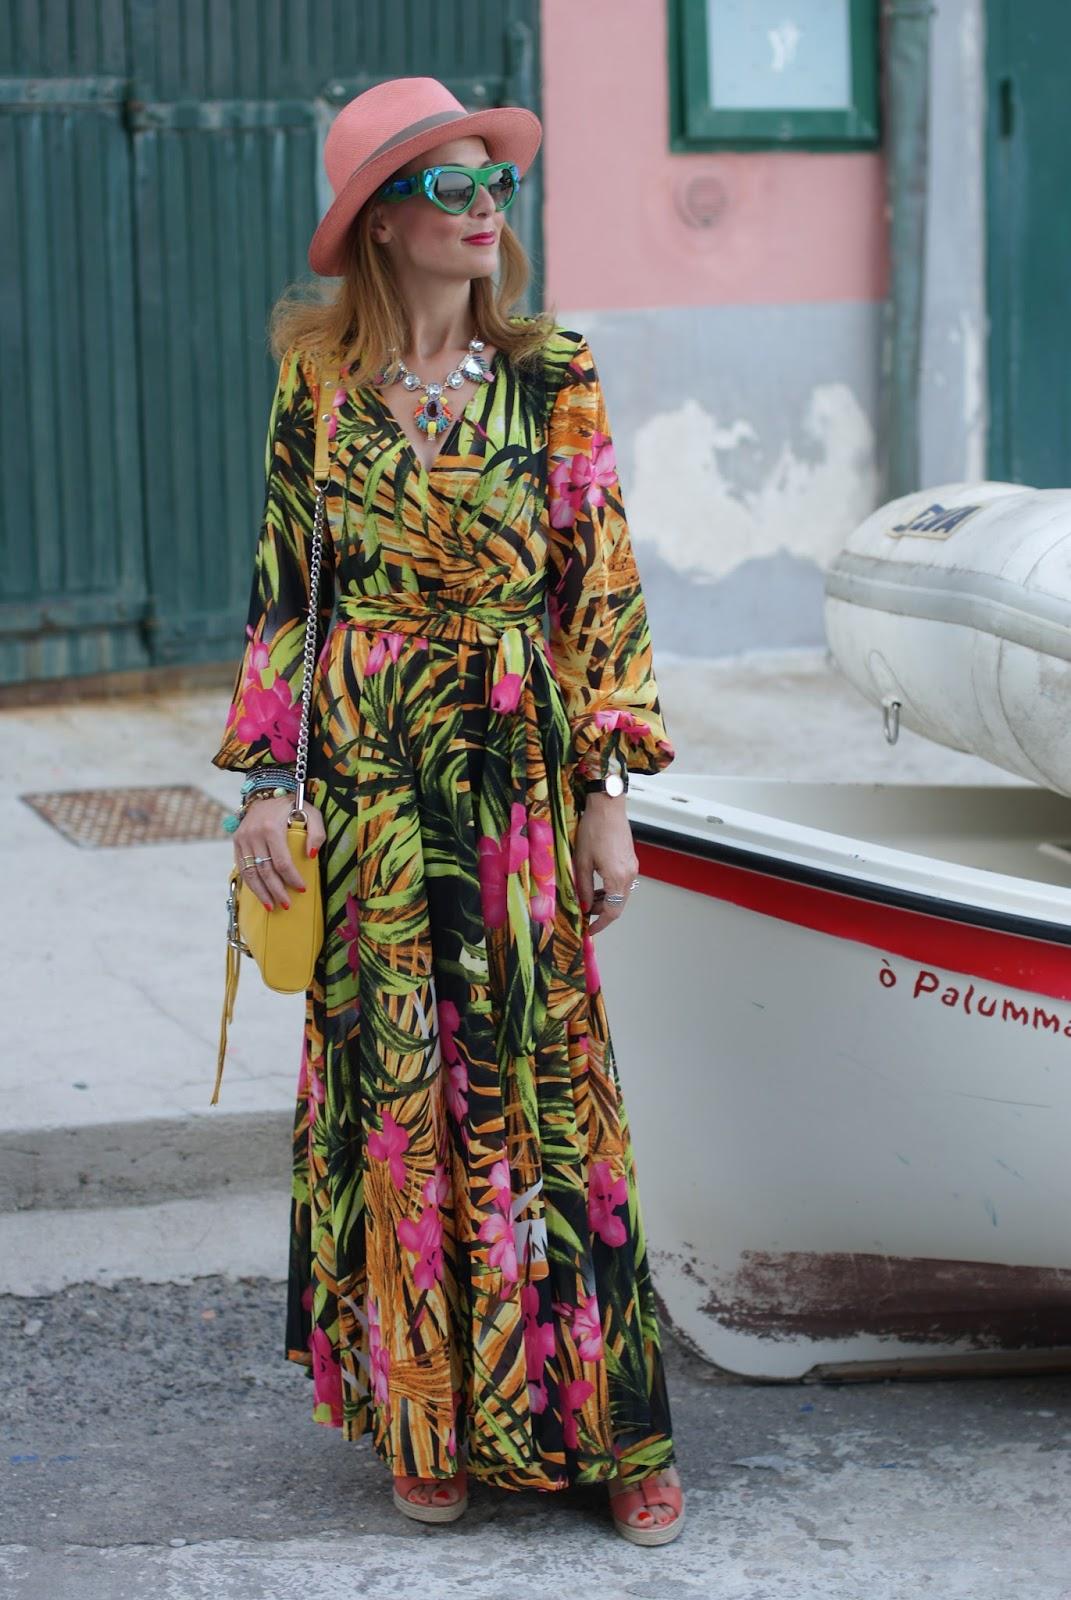 walktrendy tropical print chiffon maxi dress, prada voice sunglasses for a summer boho style on Fashion and Cookies fashion blog, fashion blogger style